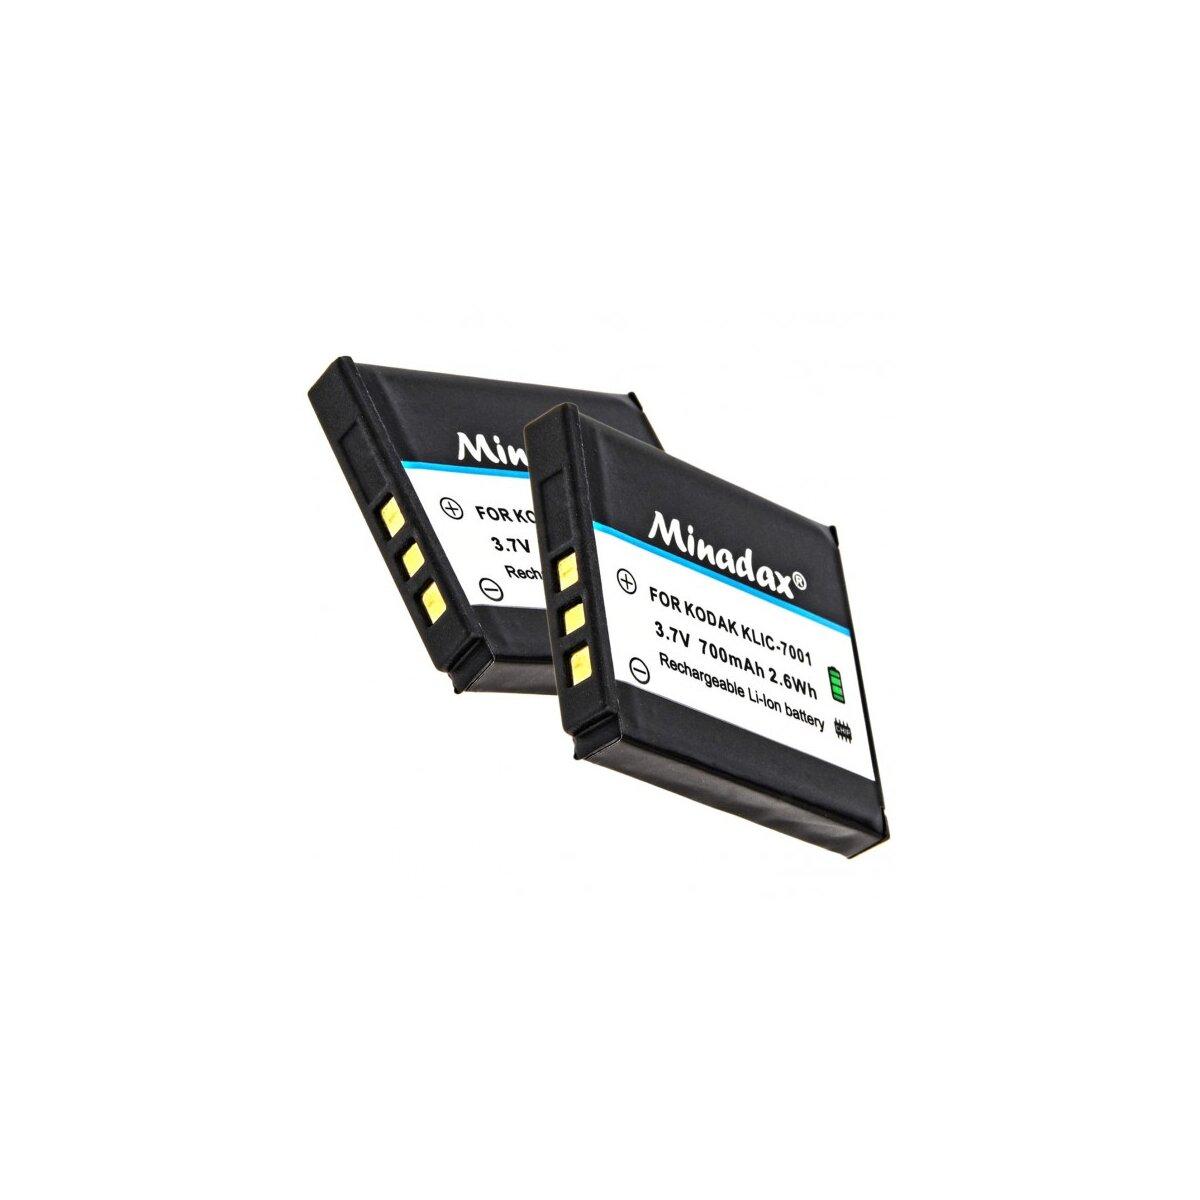 2x Minadax® Qualitaetsakku mit echten 700 mAh fuer Kodak EasyShare V550, wie KLIC-7001 - Intelligentes Akkusystem mit Chip